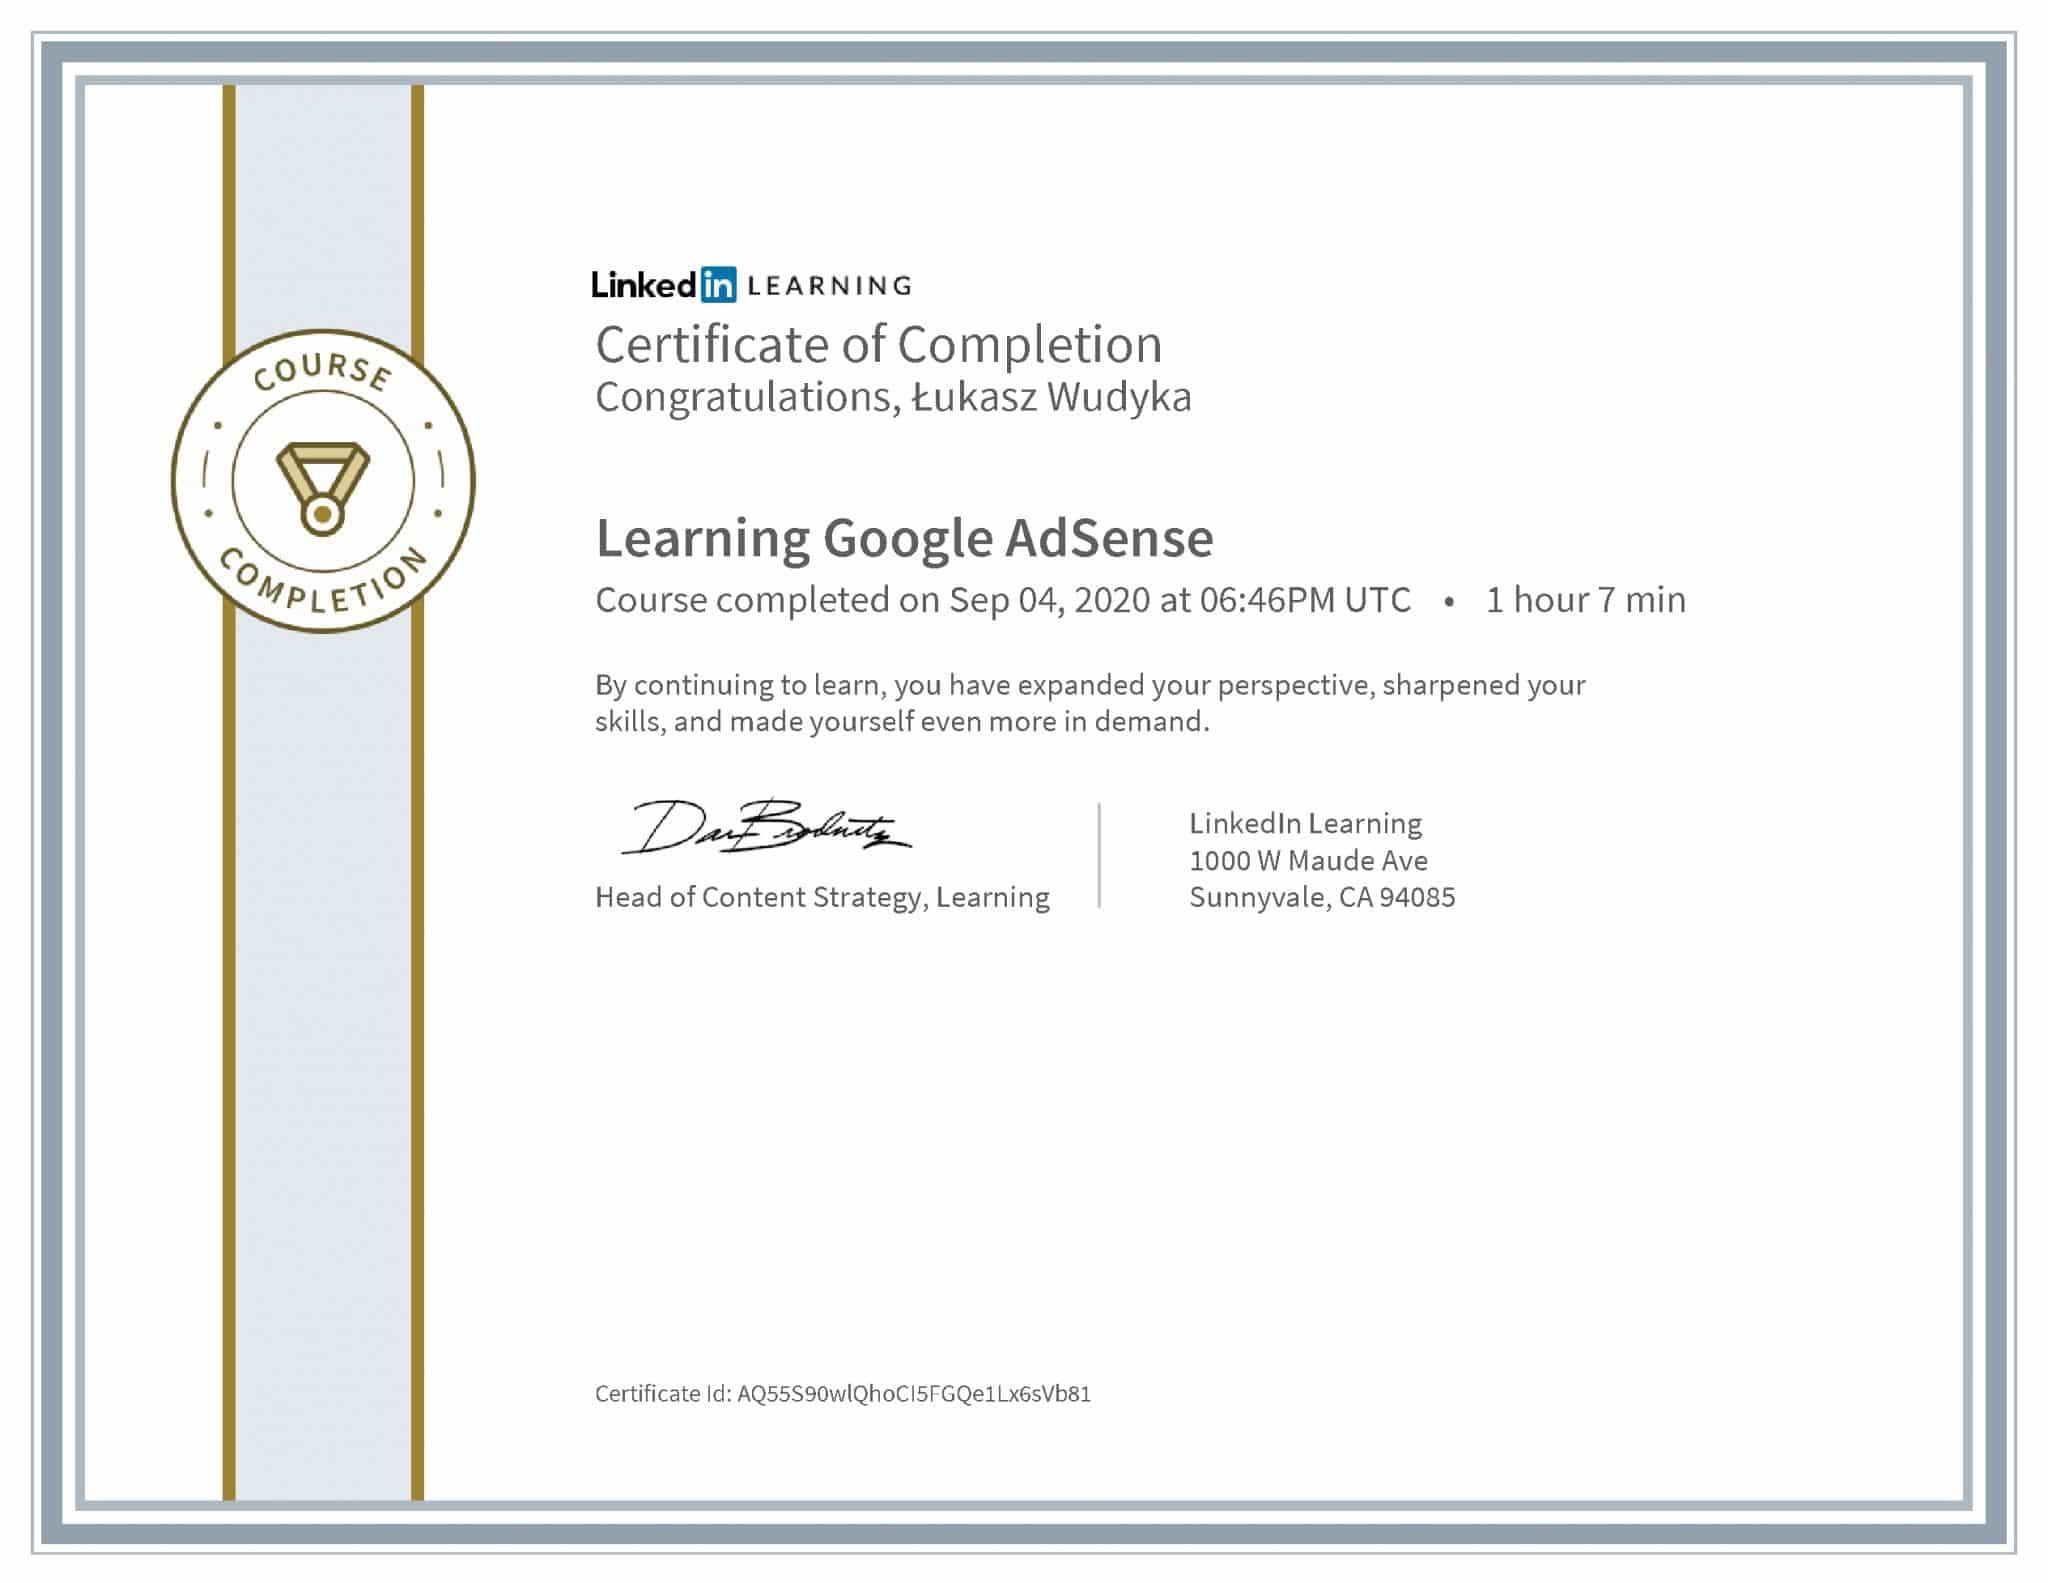 Łukasz Wudyka certyfikat LinkedIn Learning Google AdSense